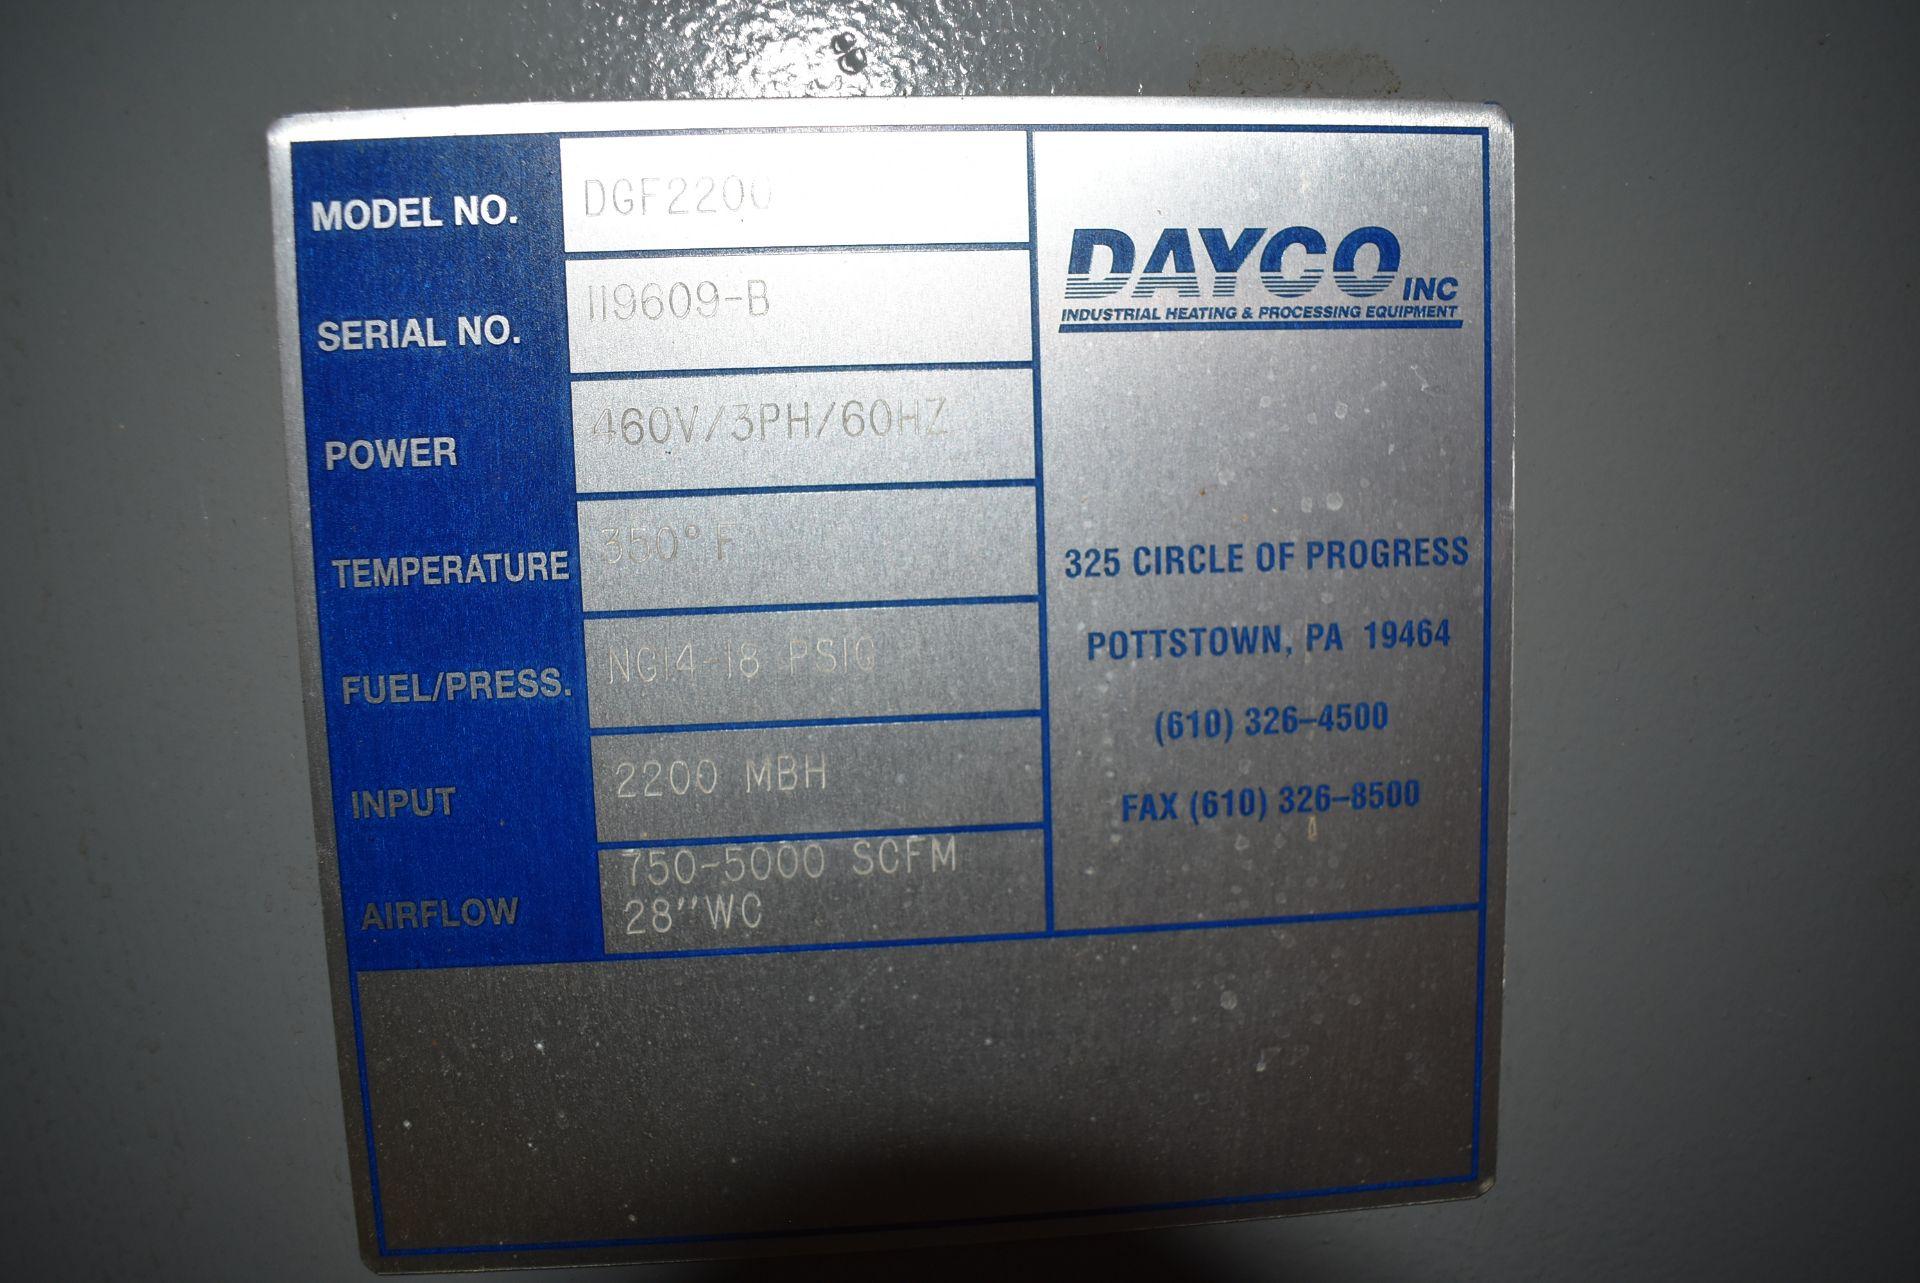 Dayco Model #DFG2200 Direct Fire Handling Unit, SN 119609-B - Image 2 of 5